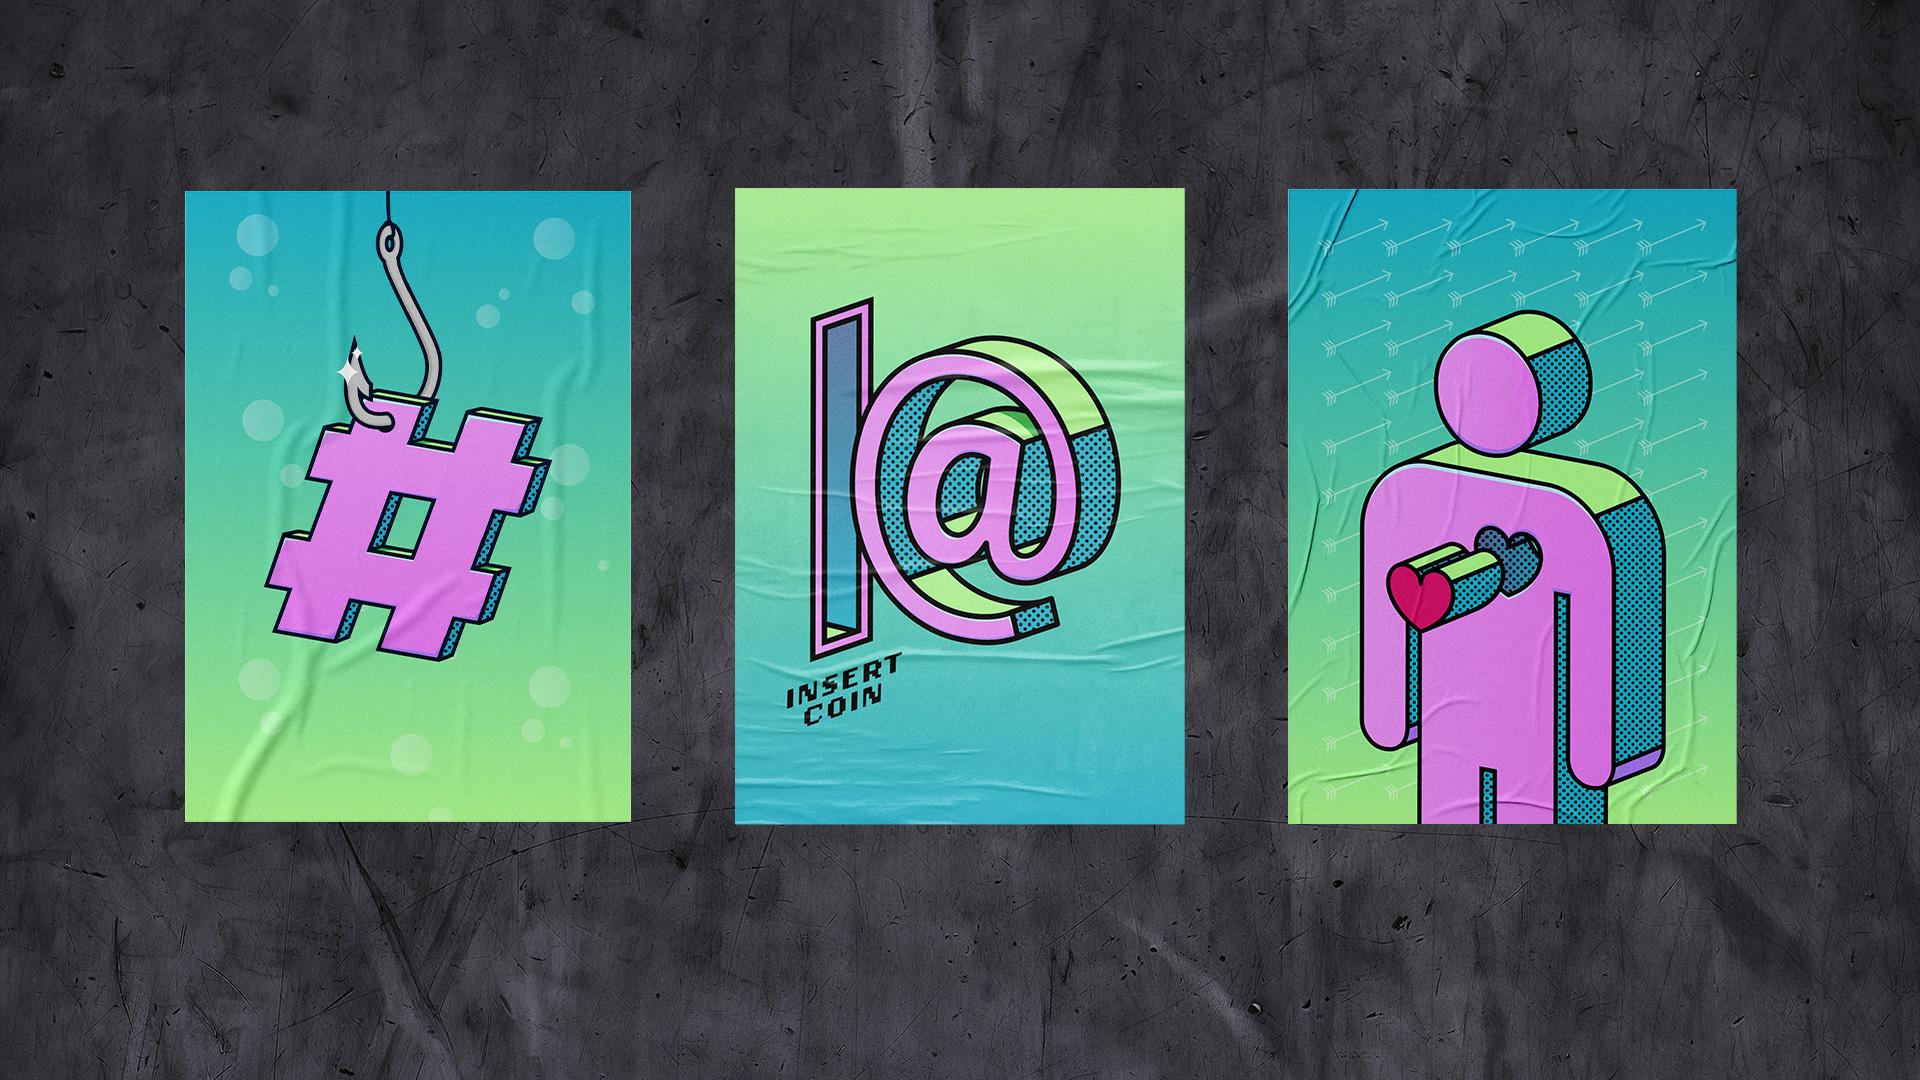 Hashtag_poster_trio_01